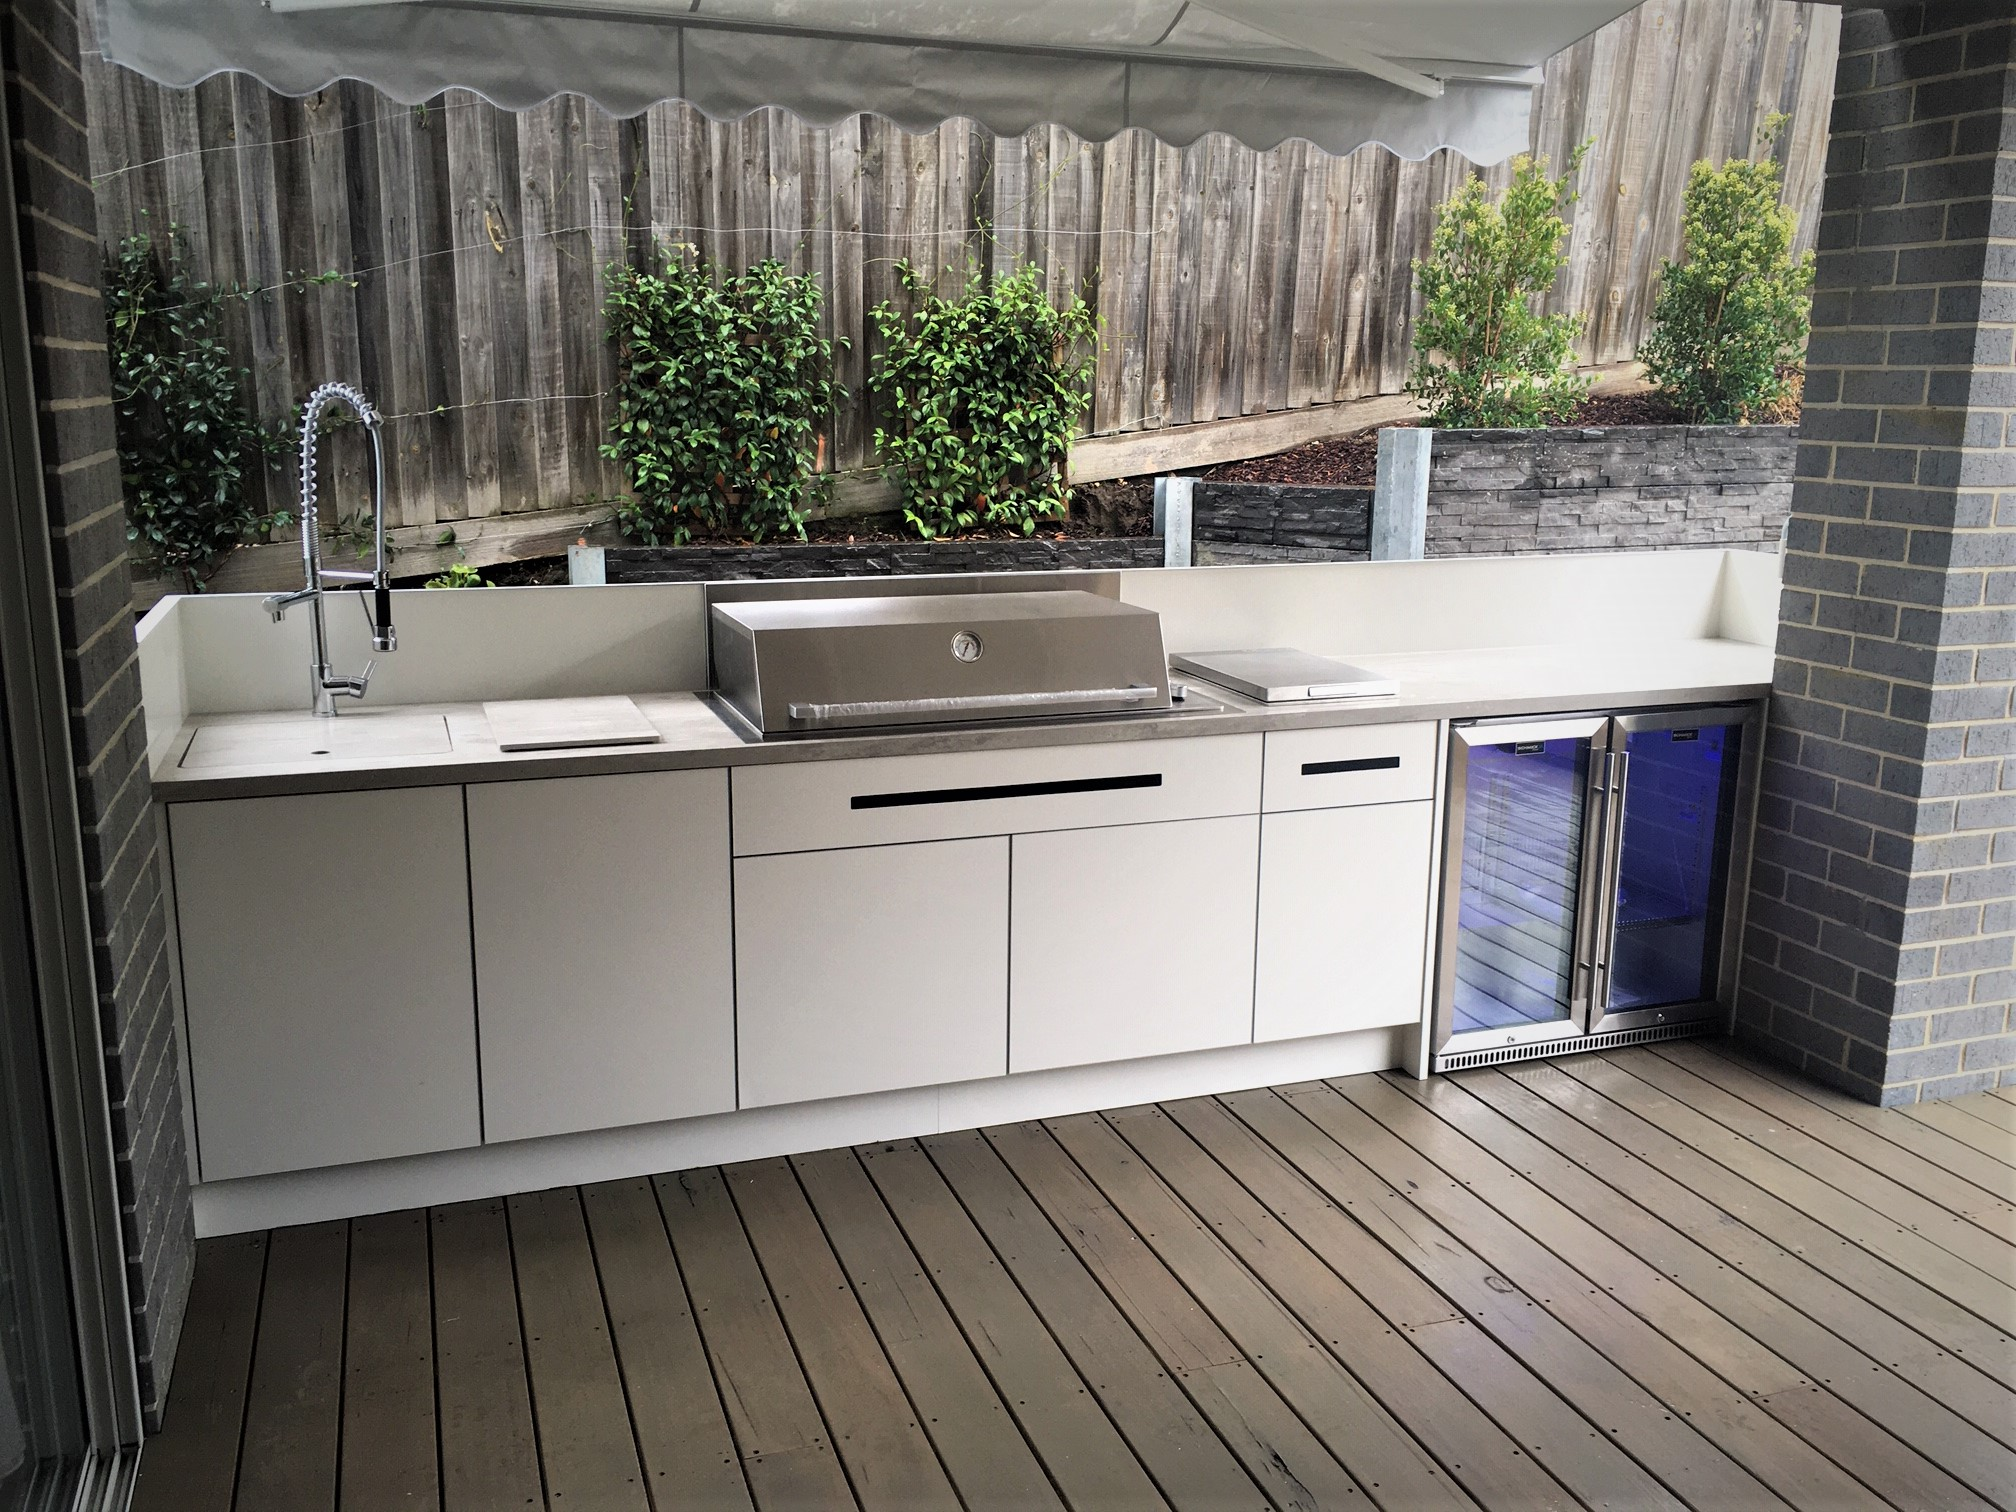 Beefeater Proline Hood Matte White Corian Neutral Concrete Alfresco Outdoor Kitchen 1